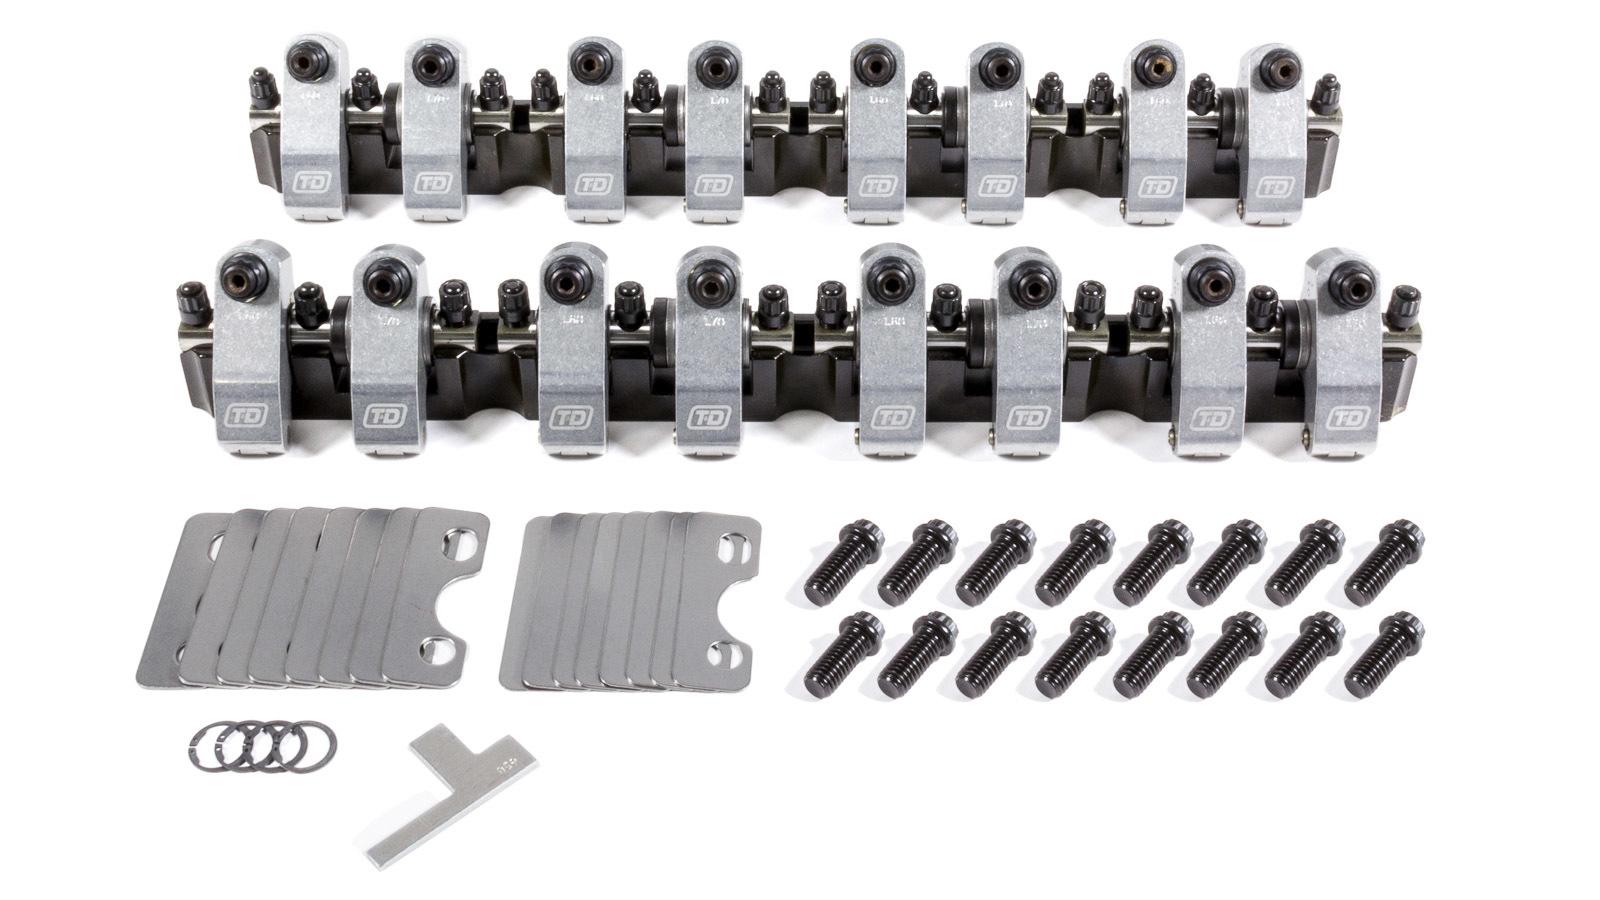 T&D Machine 7304-170/160 Rocker Arm, Shaft Mount, 1.70 / 1.60 Ratio, Full Roller, Aluminum, Natural, Edelbrock Victor Jr Heads, Small Block Ford, Kit